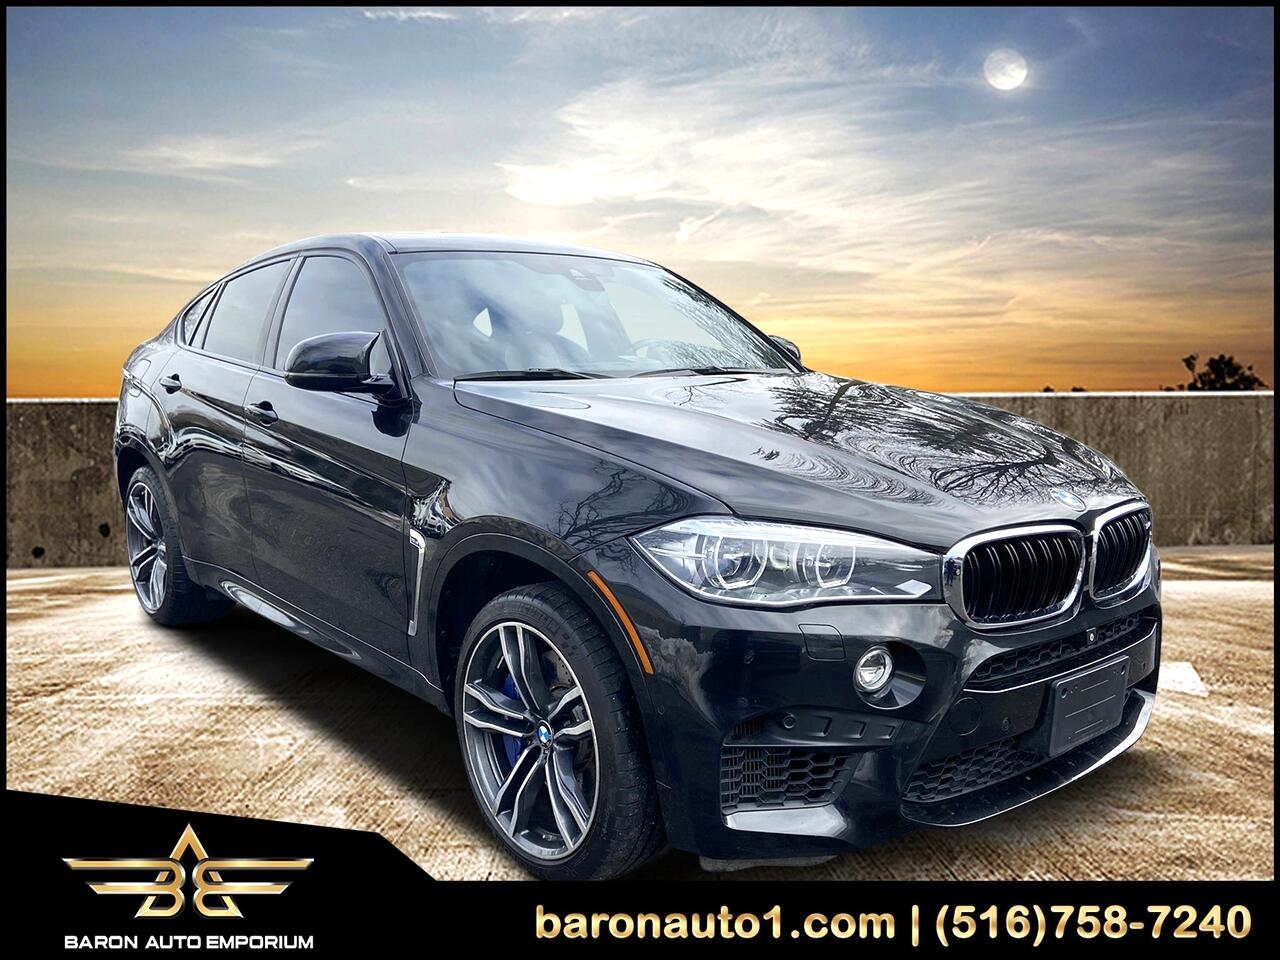 BMW X6 M Sports Activity Coupe 2017